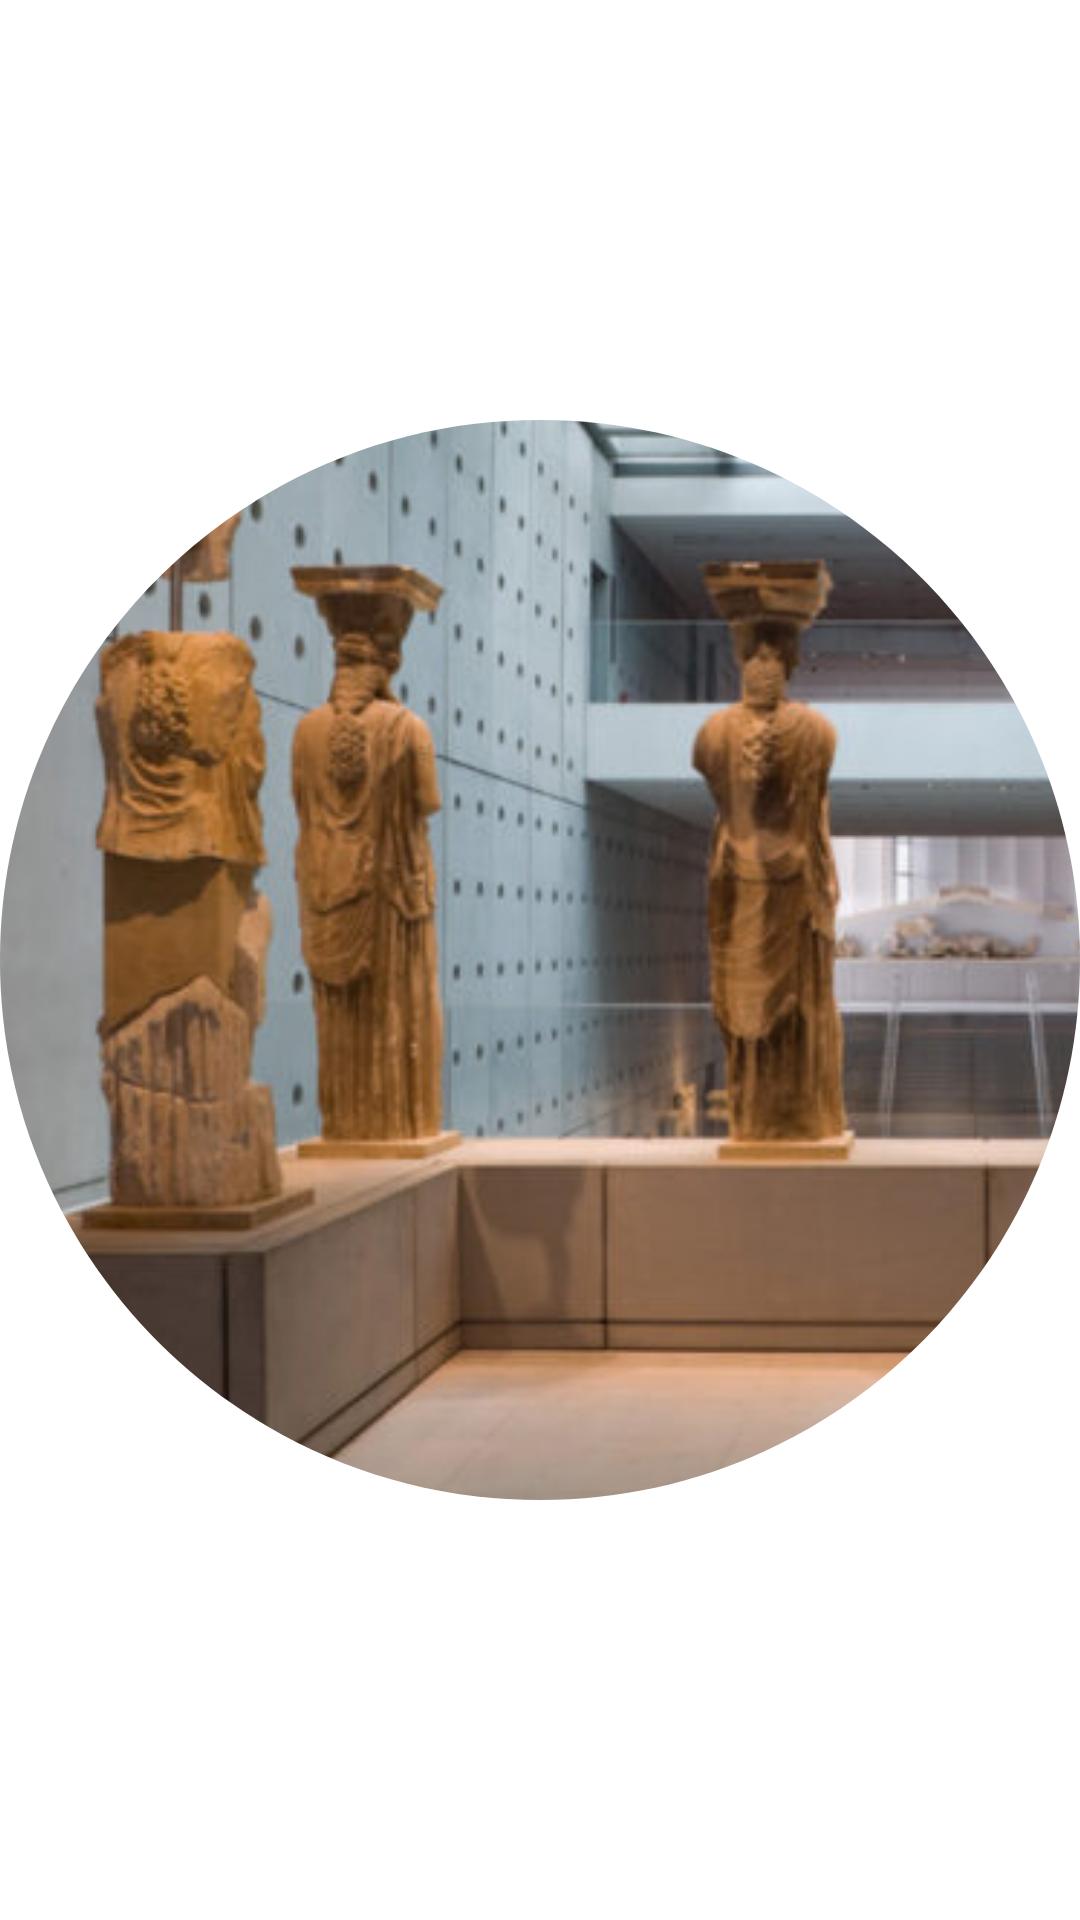 acropolis_museum_zvoura.gr